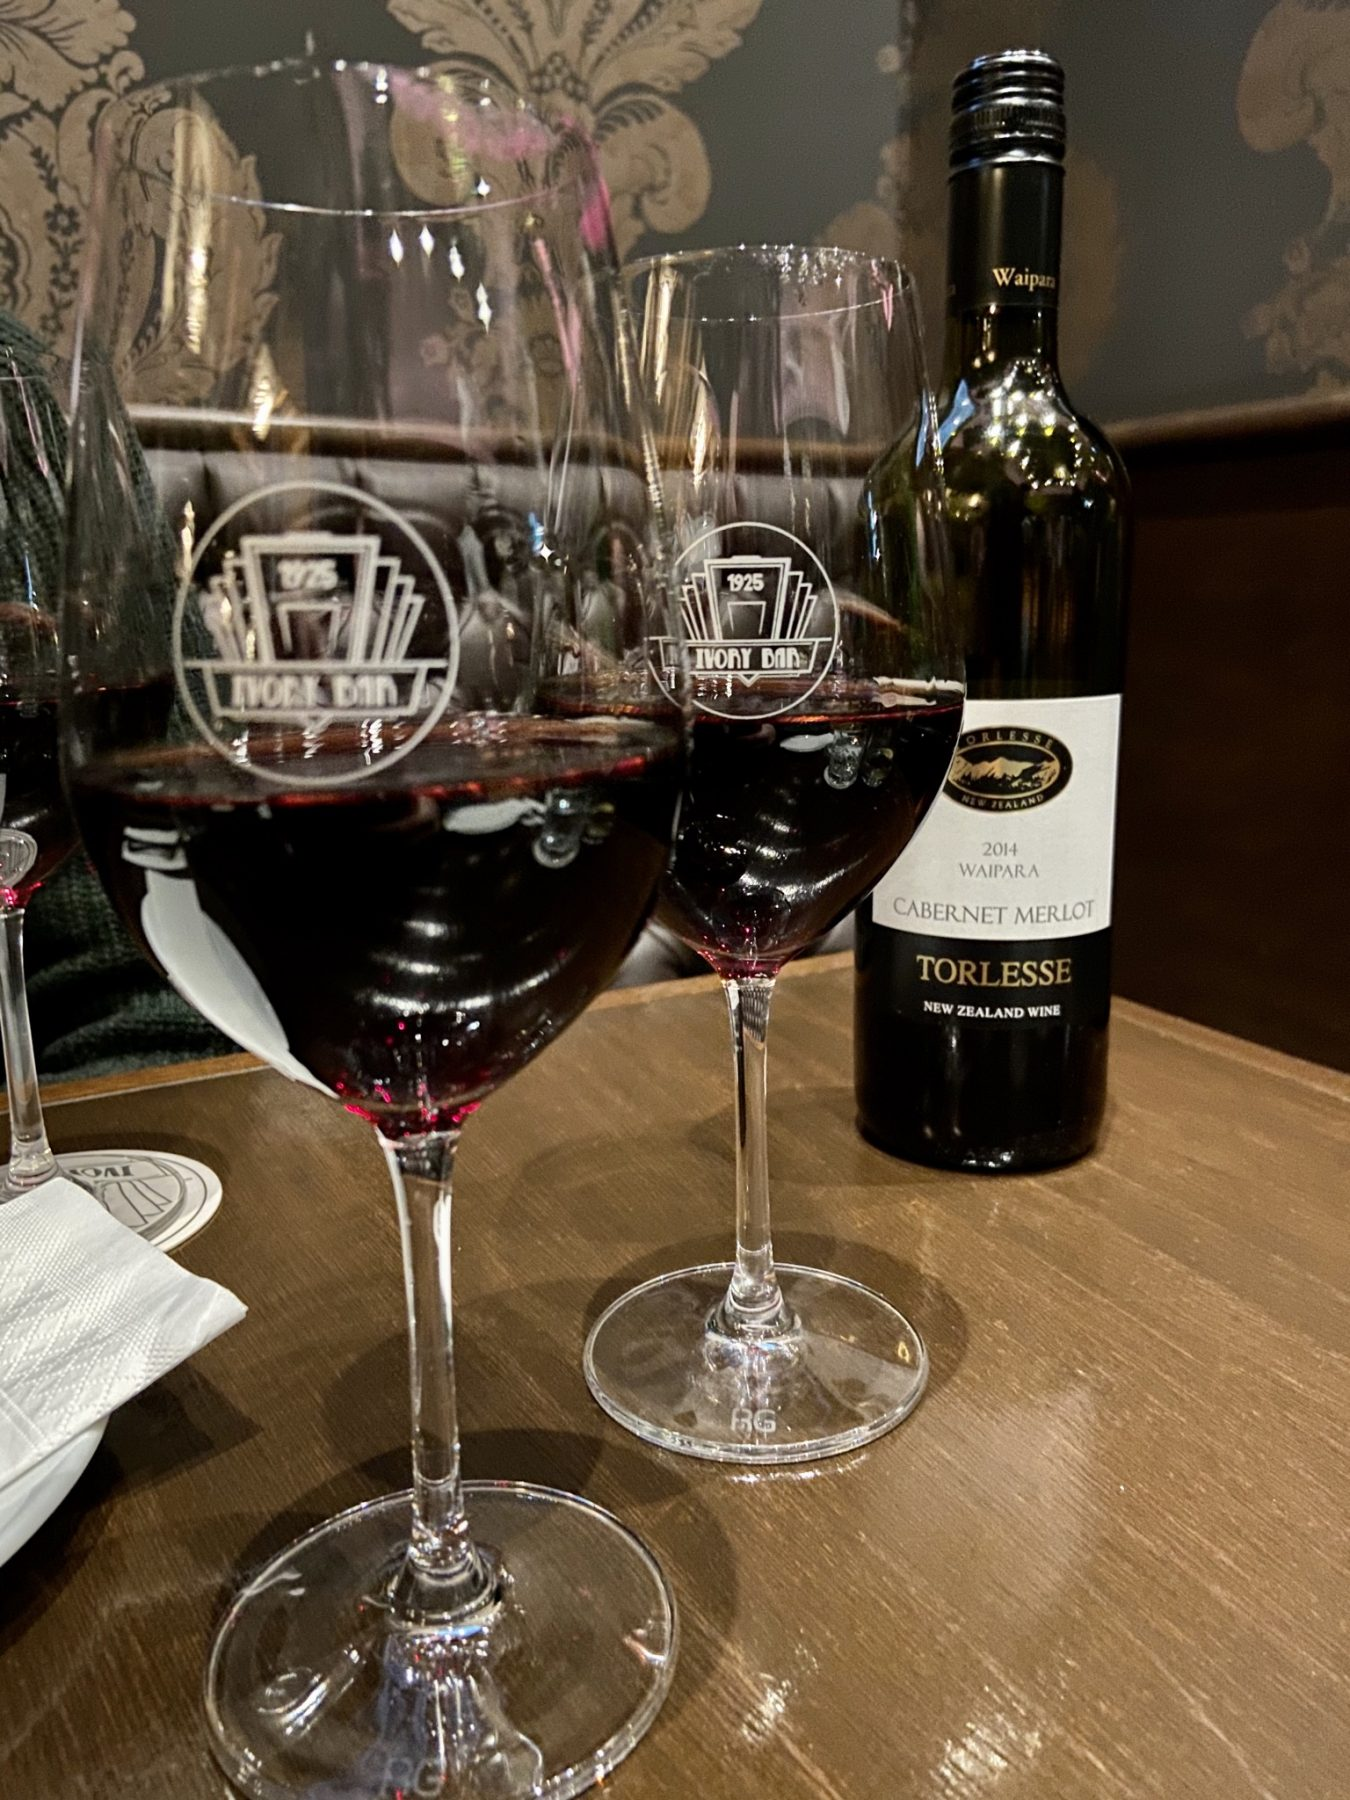 Ivory Bar Rangiora Wine Glasses Torlesse Cabernet Merlot